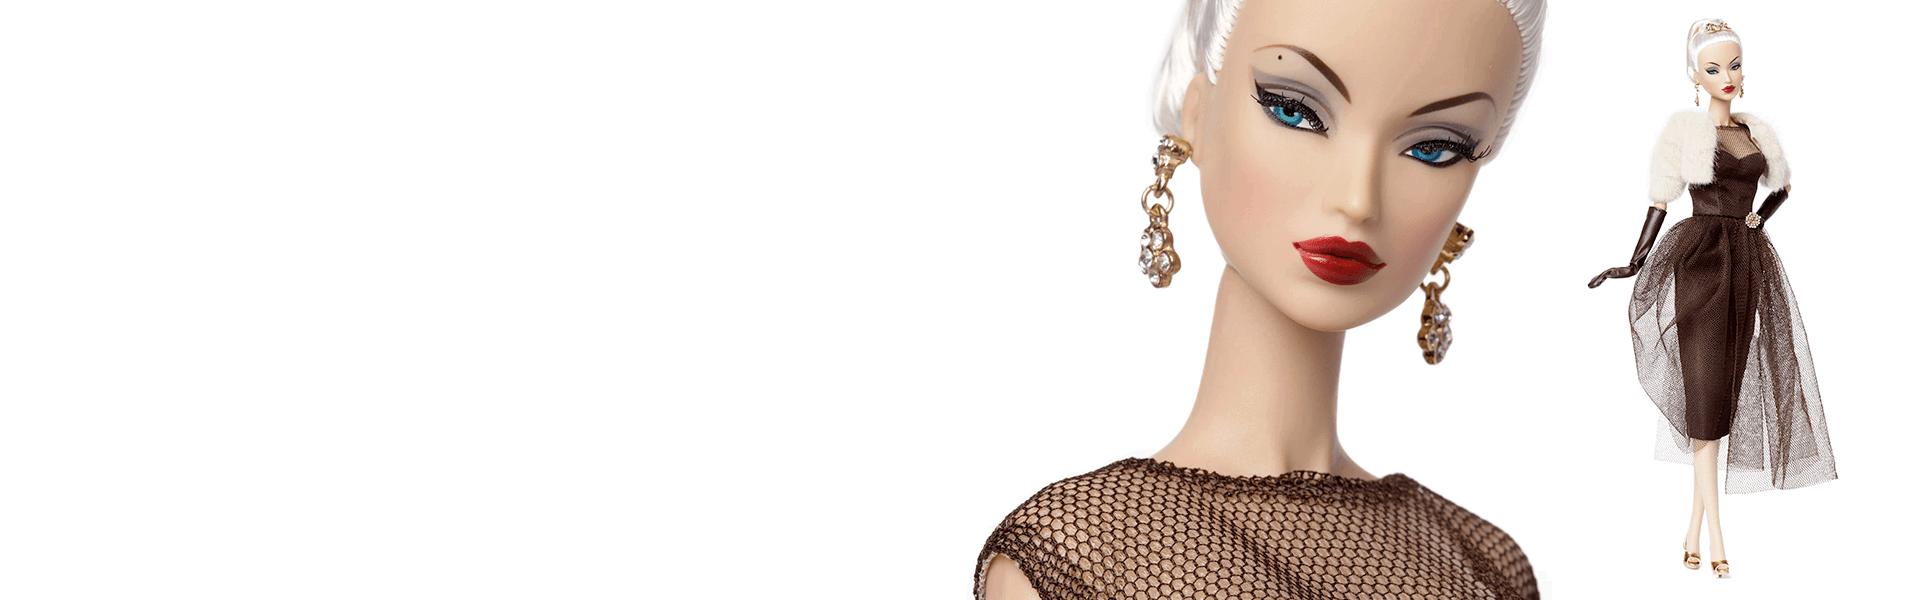 Dynamite Girls Jem Victoire Roux Poppy Parker Fashion Royalty Metallic Long Doll Gloves for Integrity Toys dolls